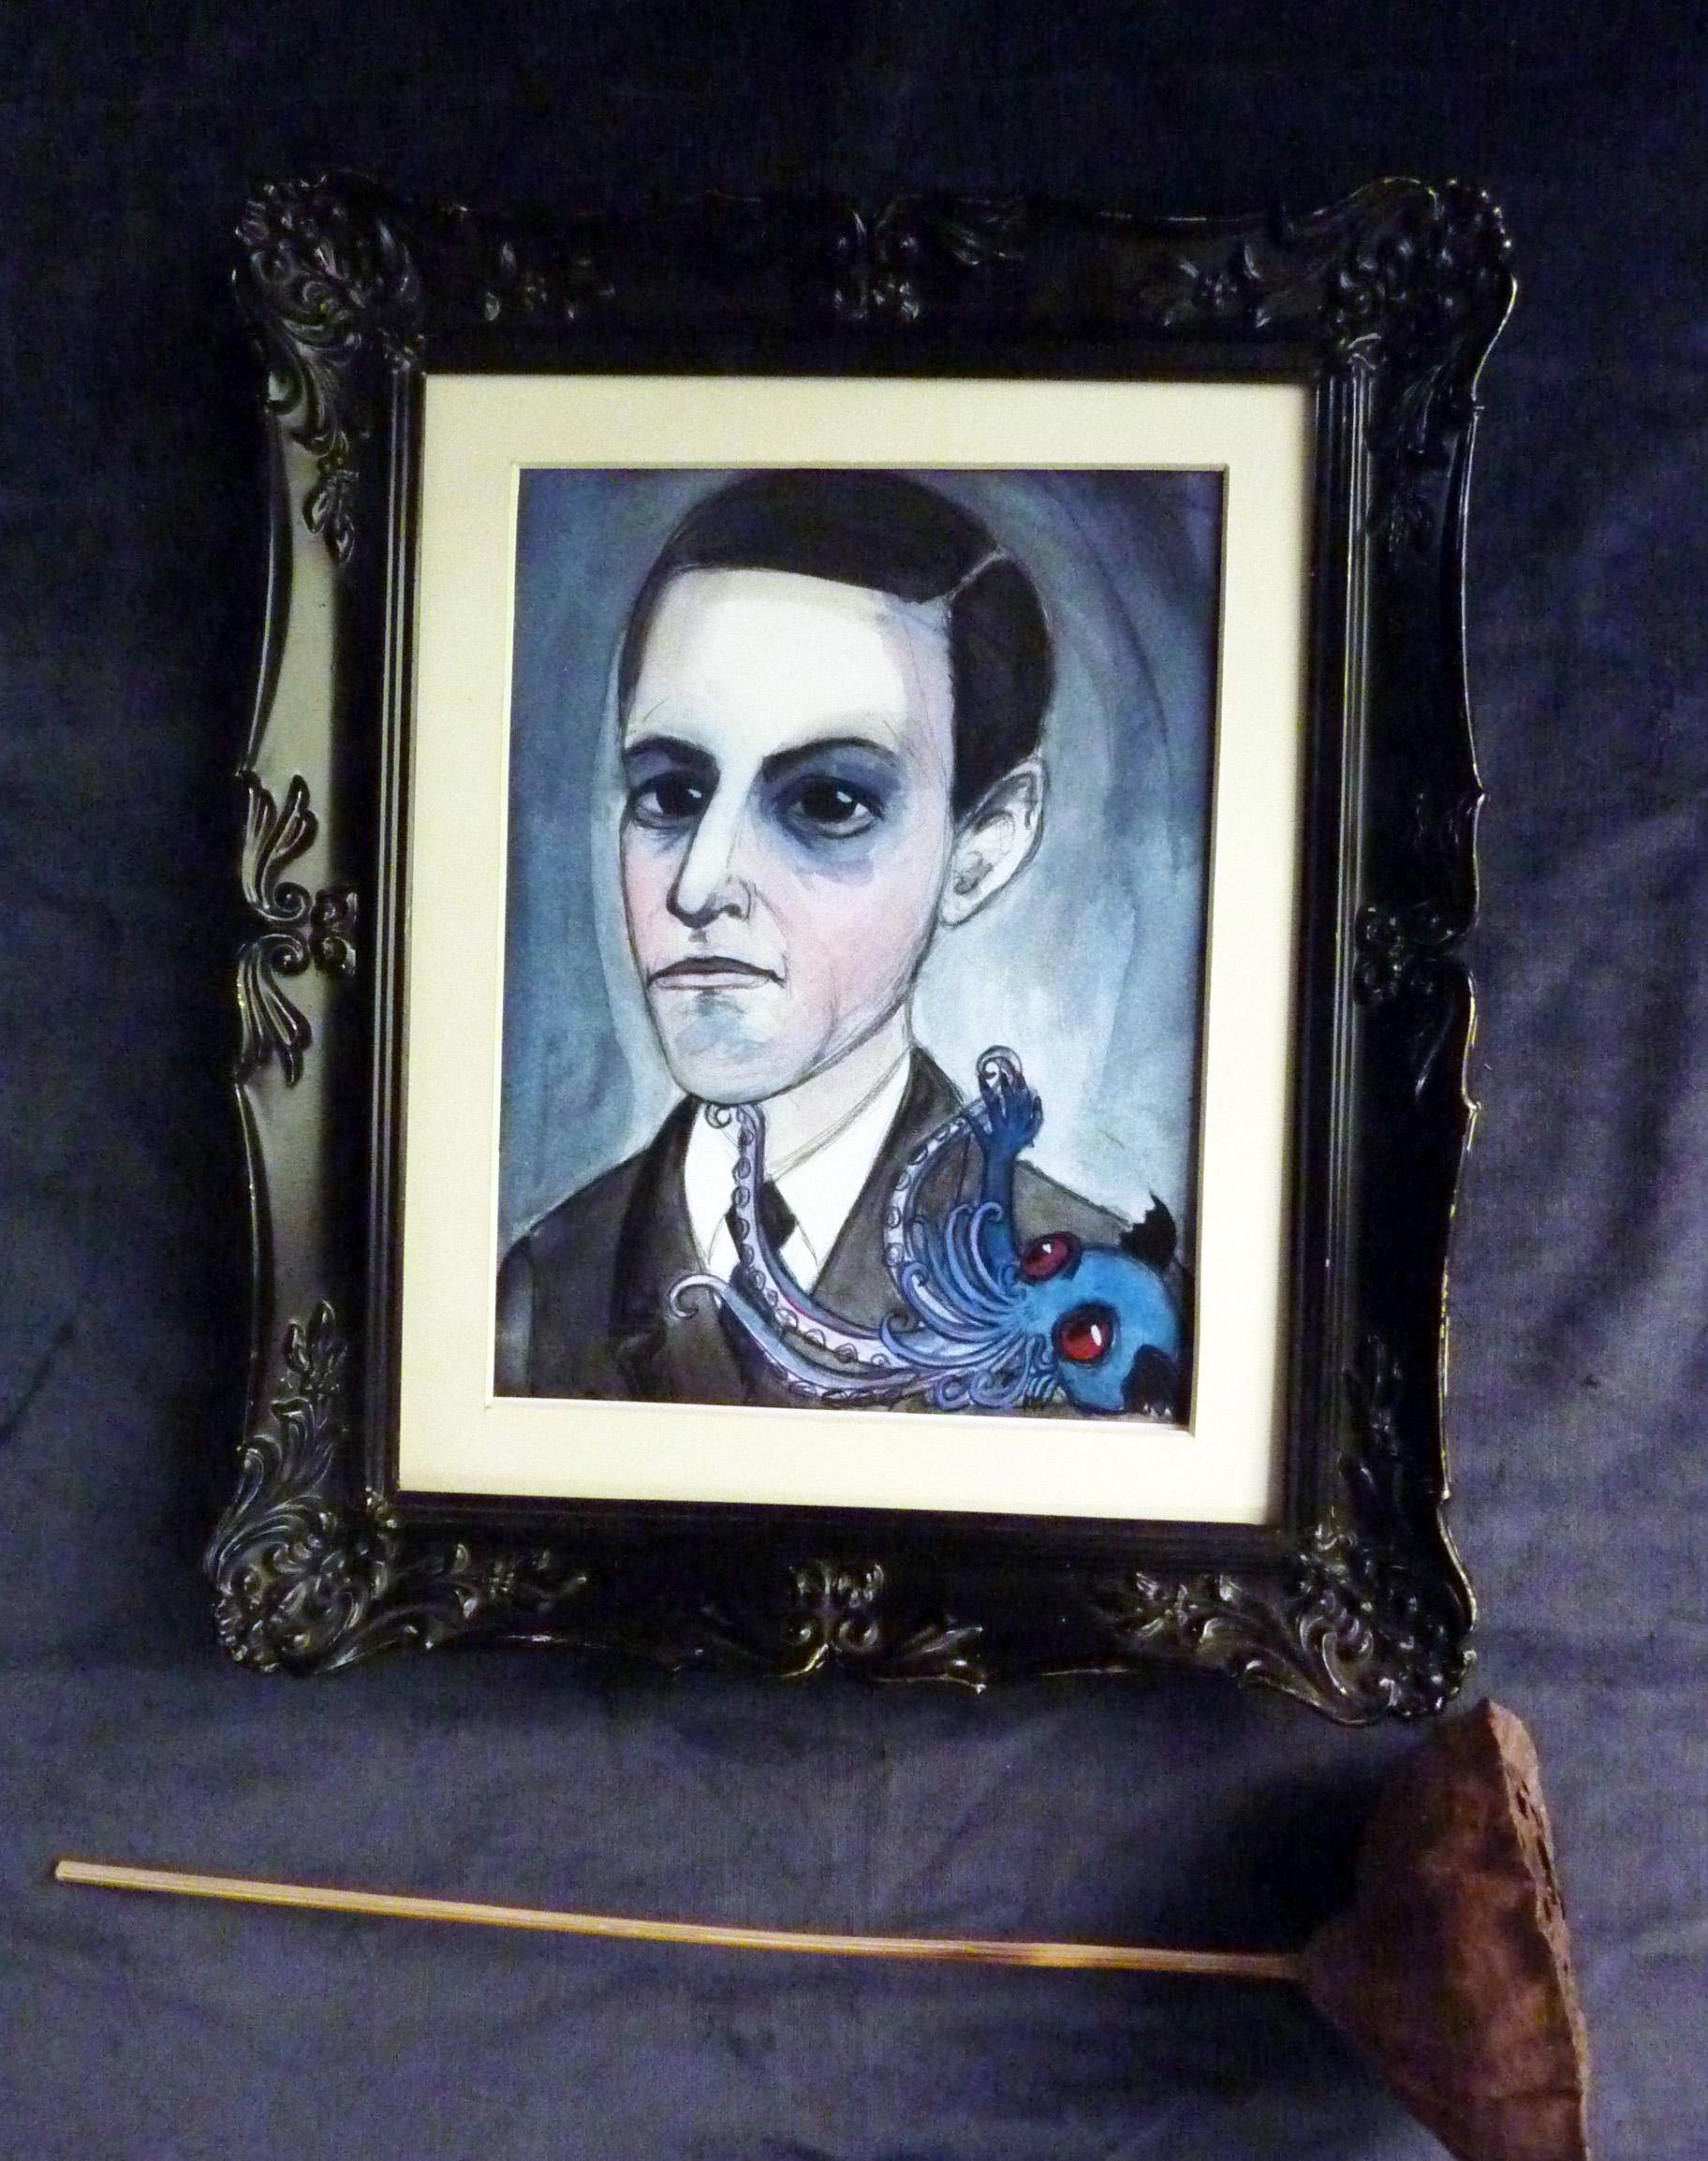 h.p. lovecraft art Print Framed